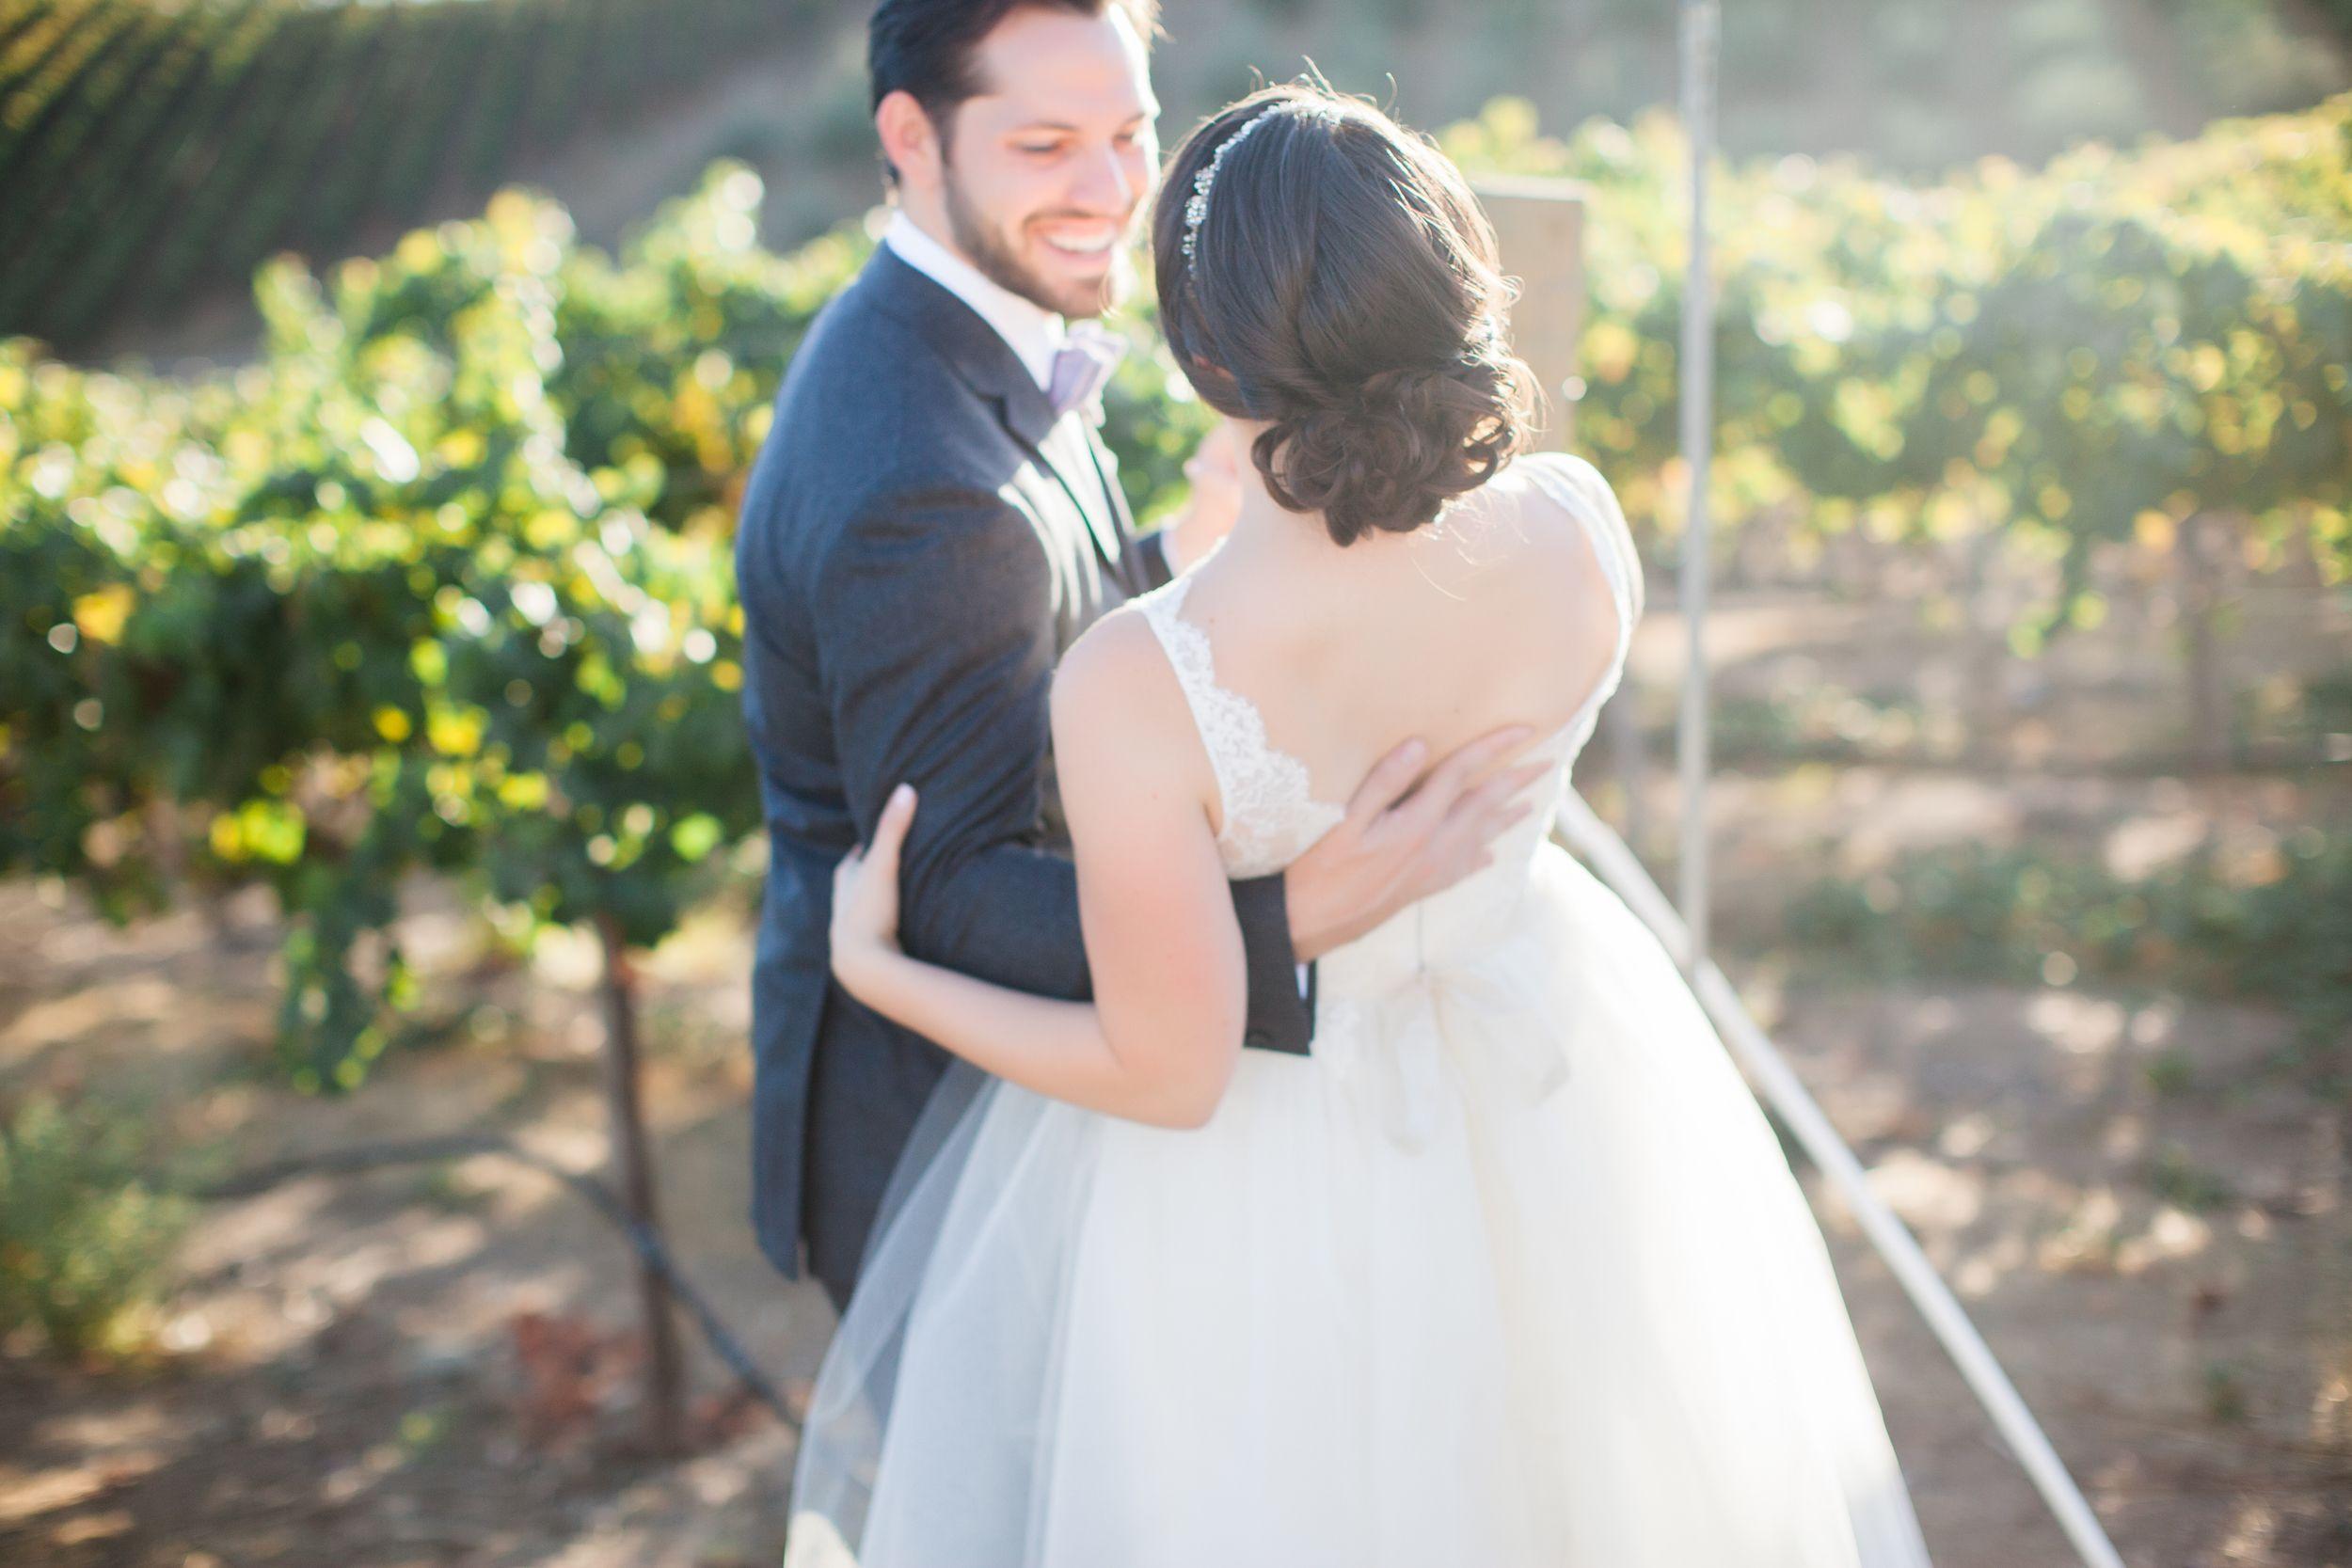 Make your love an eternal memory through wedding photography